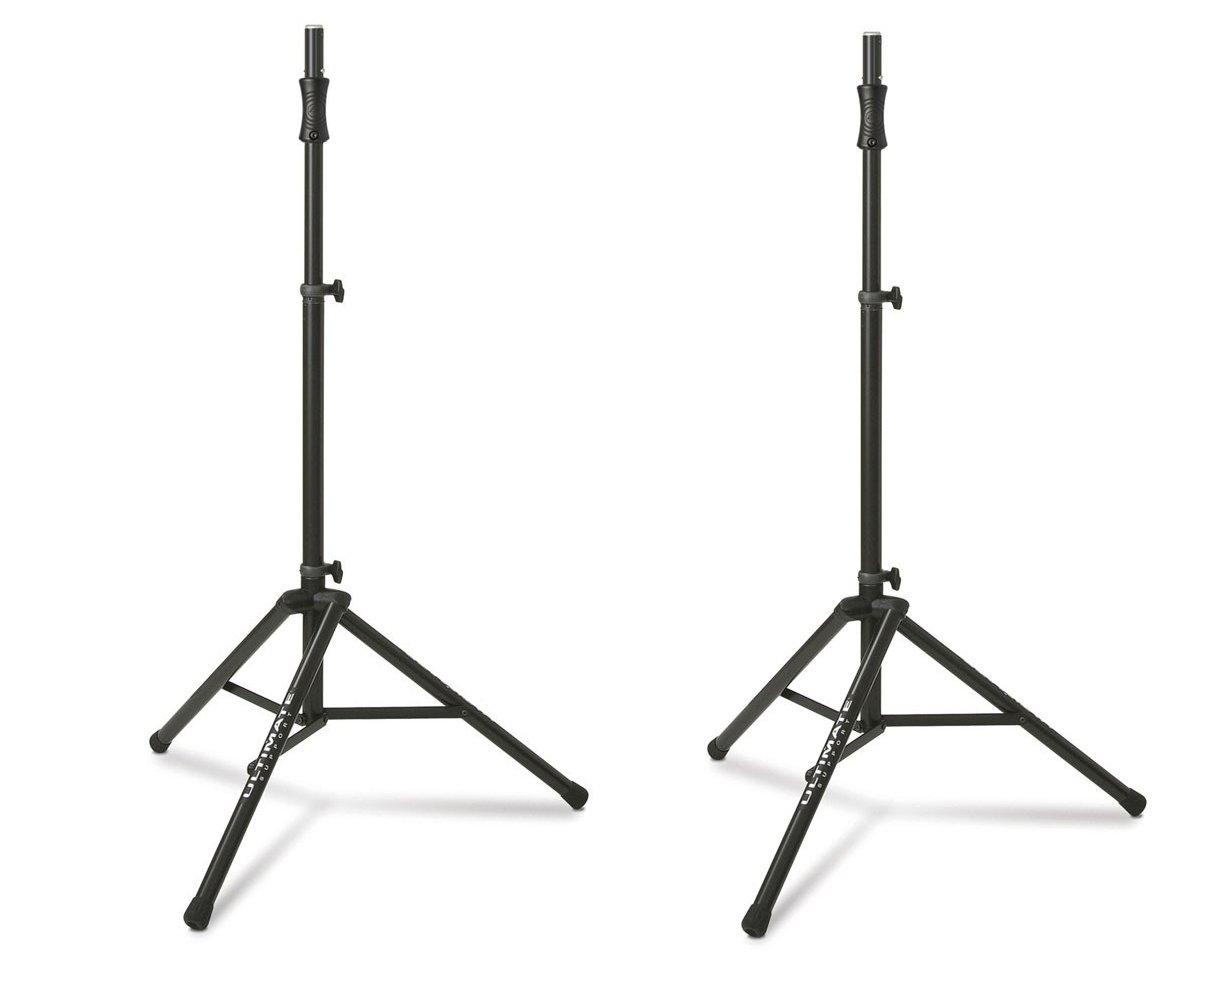 Ultimate Support TS-100B (2-Pack) Lift-Assist Aluminum Tripod Speaker Stands